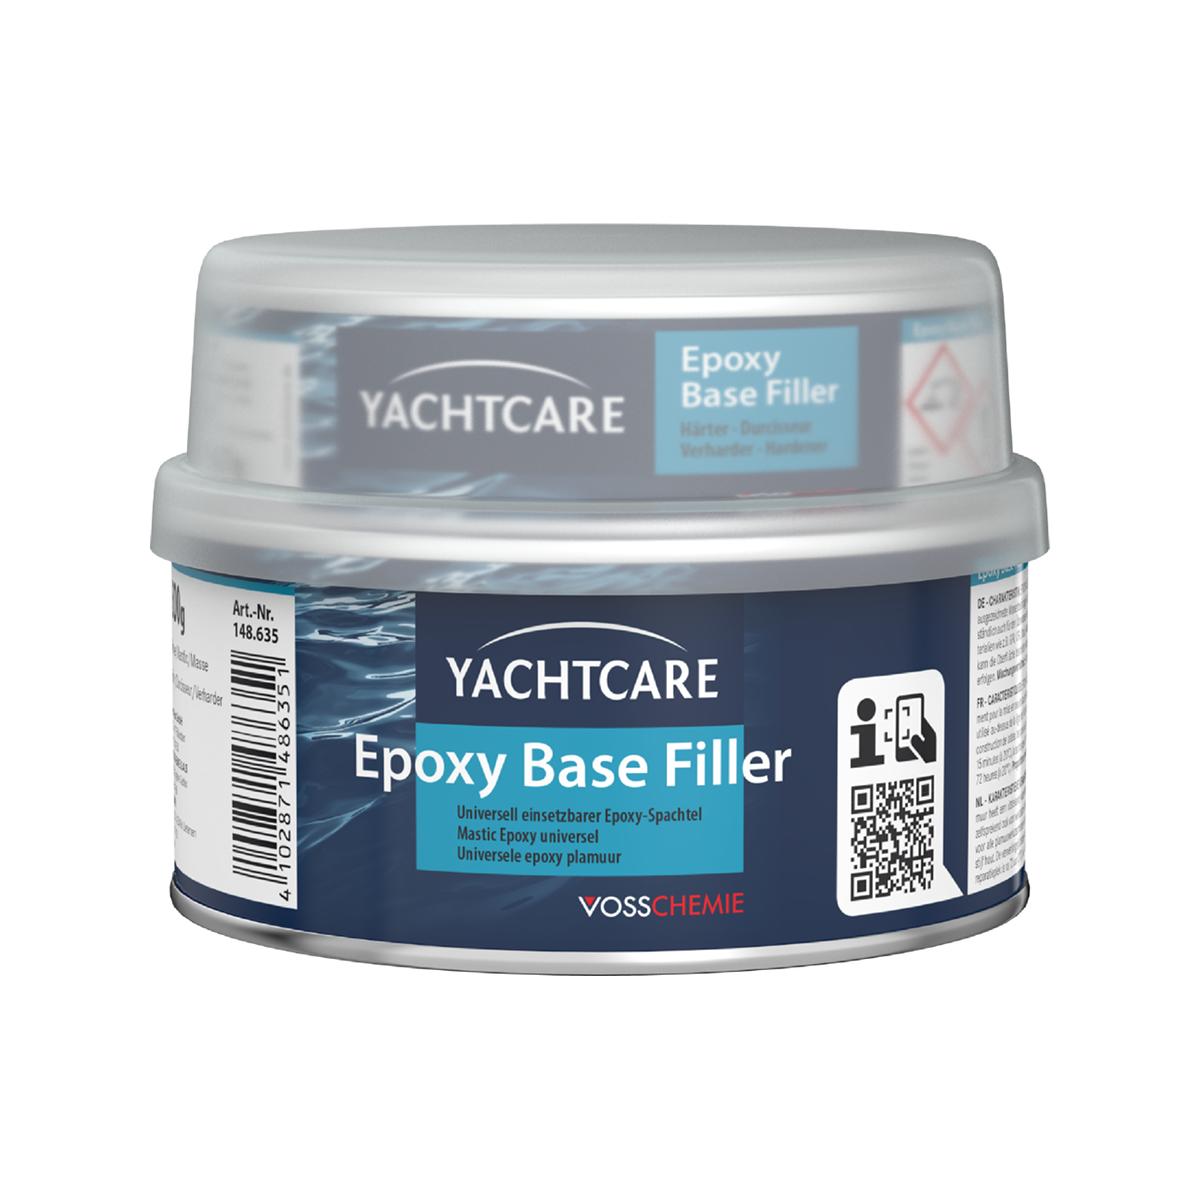 Yachtcare Exposy Base Filter plamuur lichtgrijs - 500g